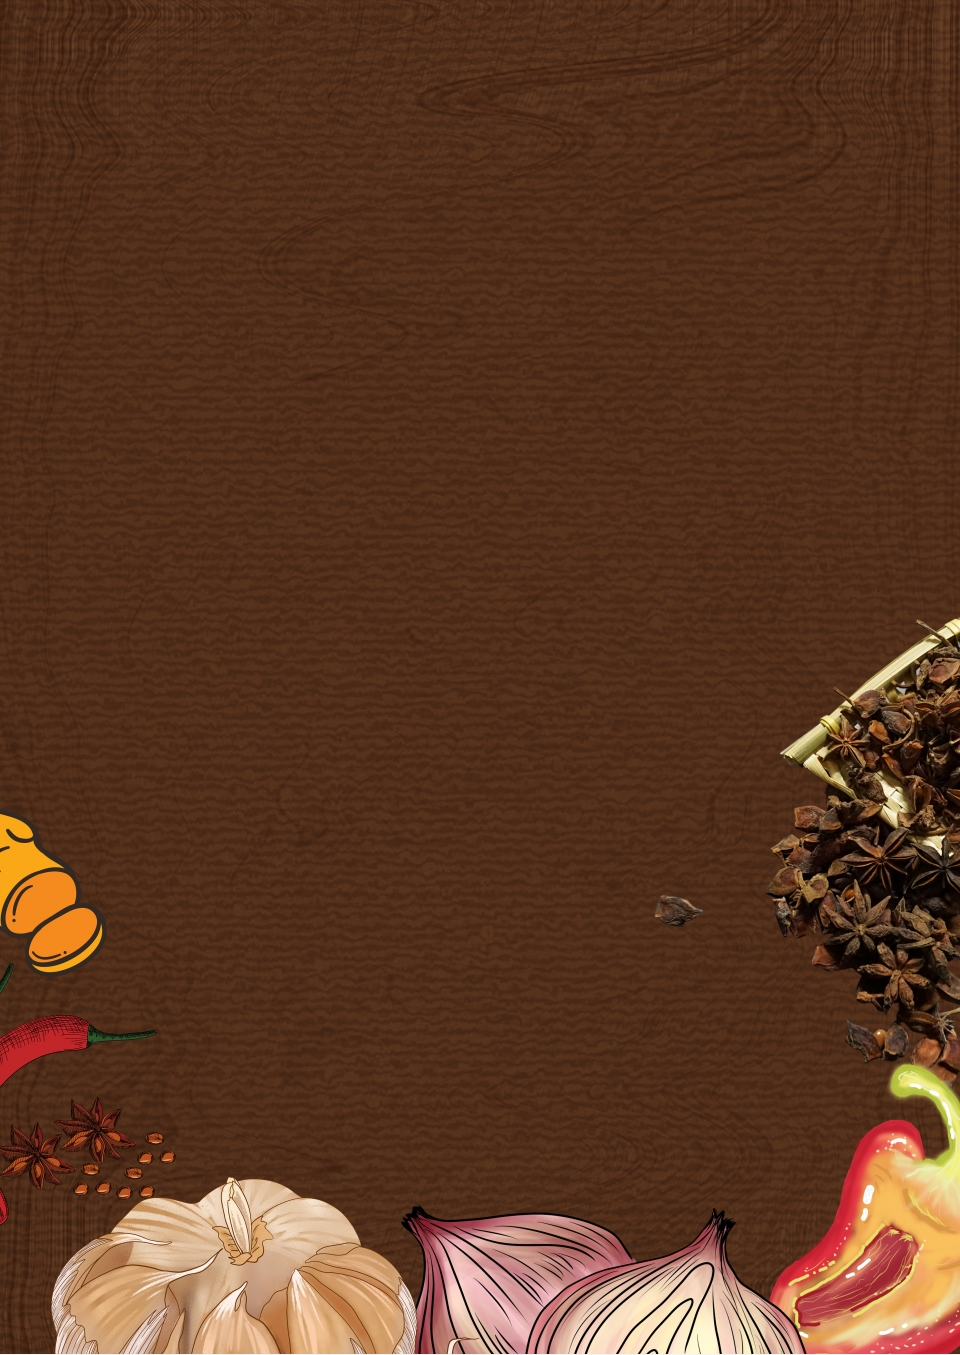 Seasoning Ingredients Spice H5 Background Spices Ingredients Condiments Background Image For Free Download